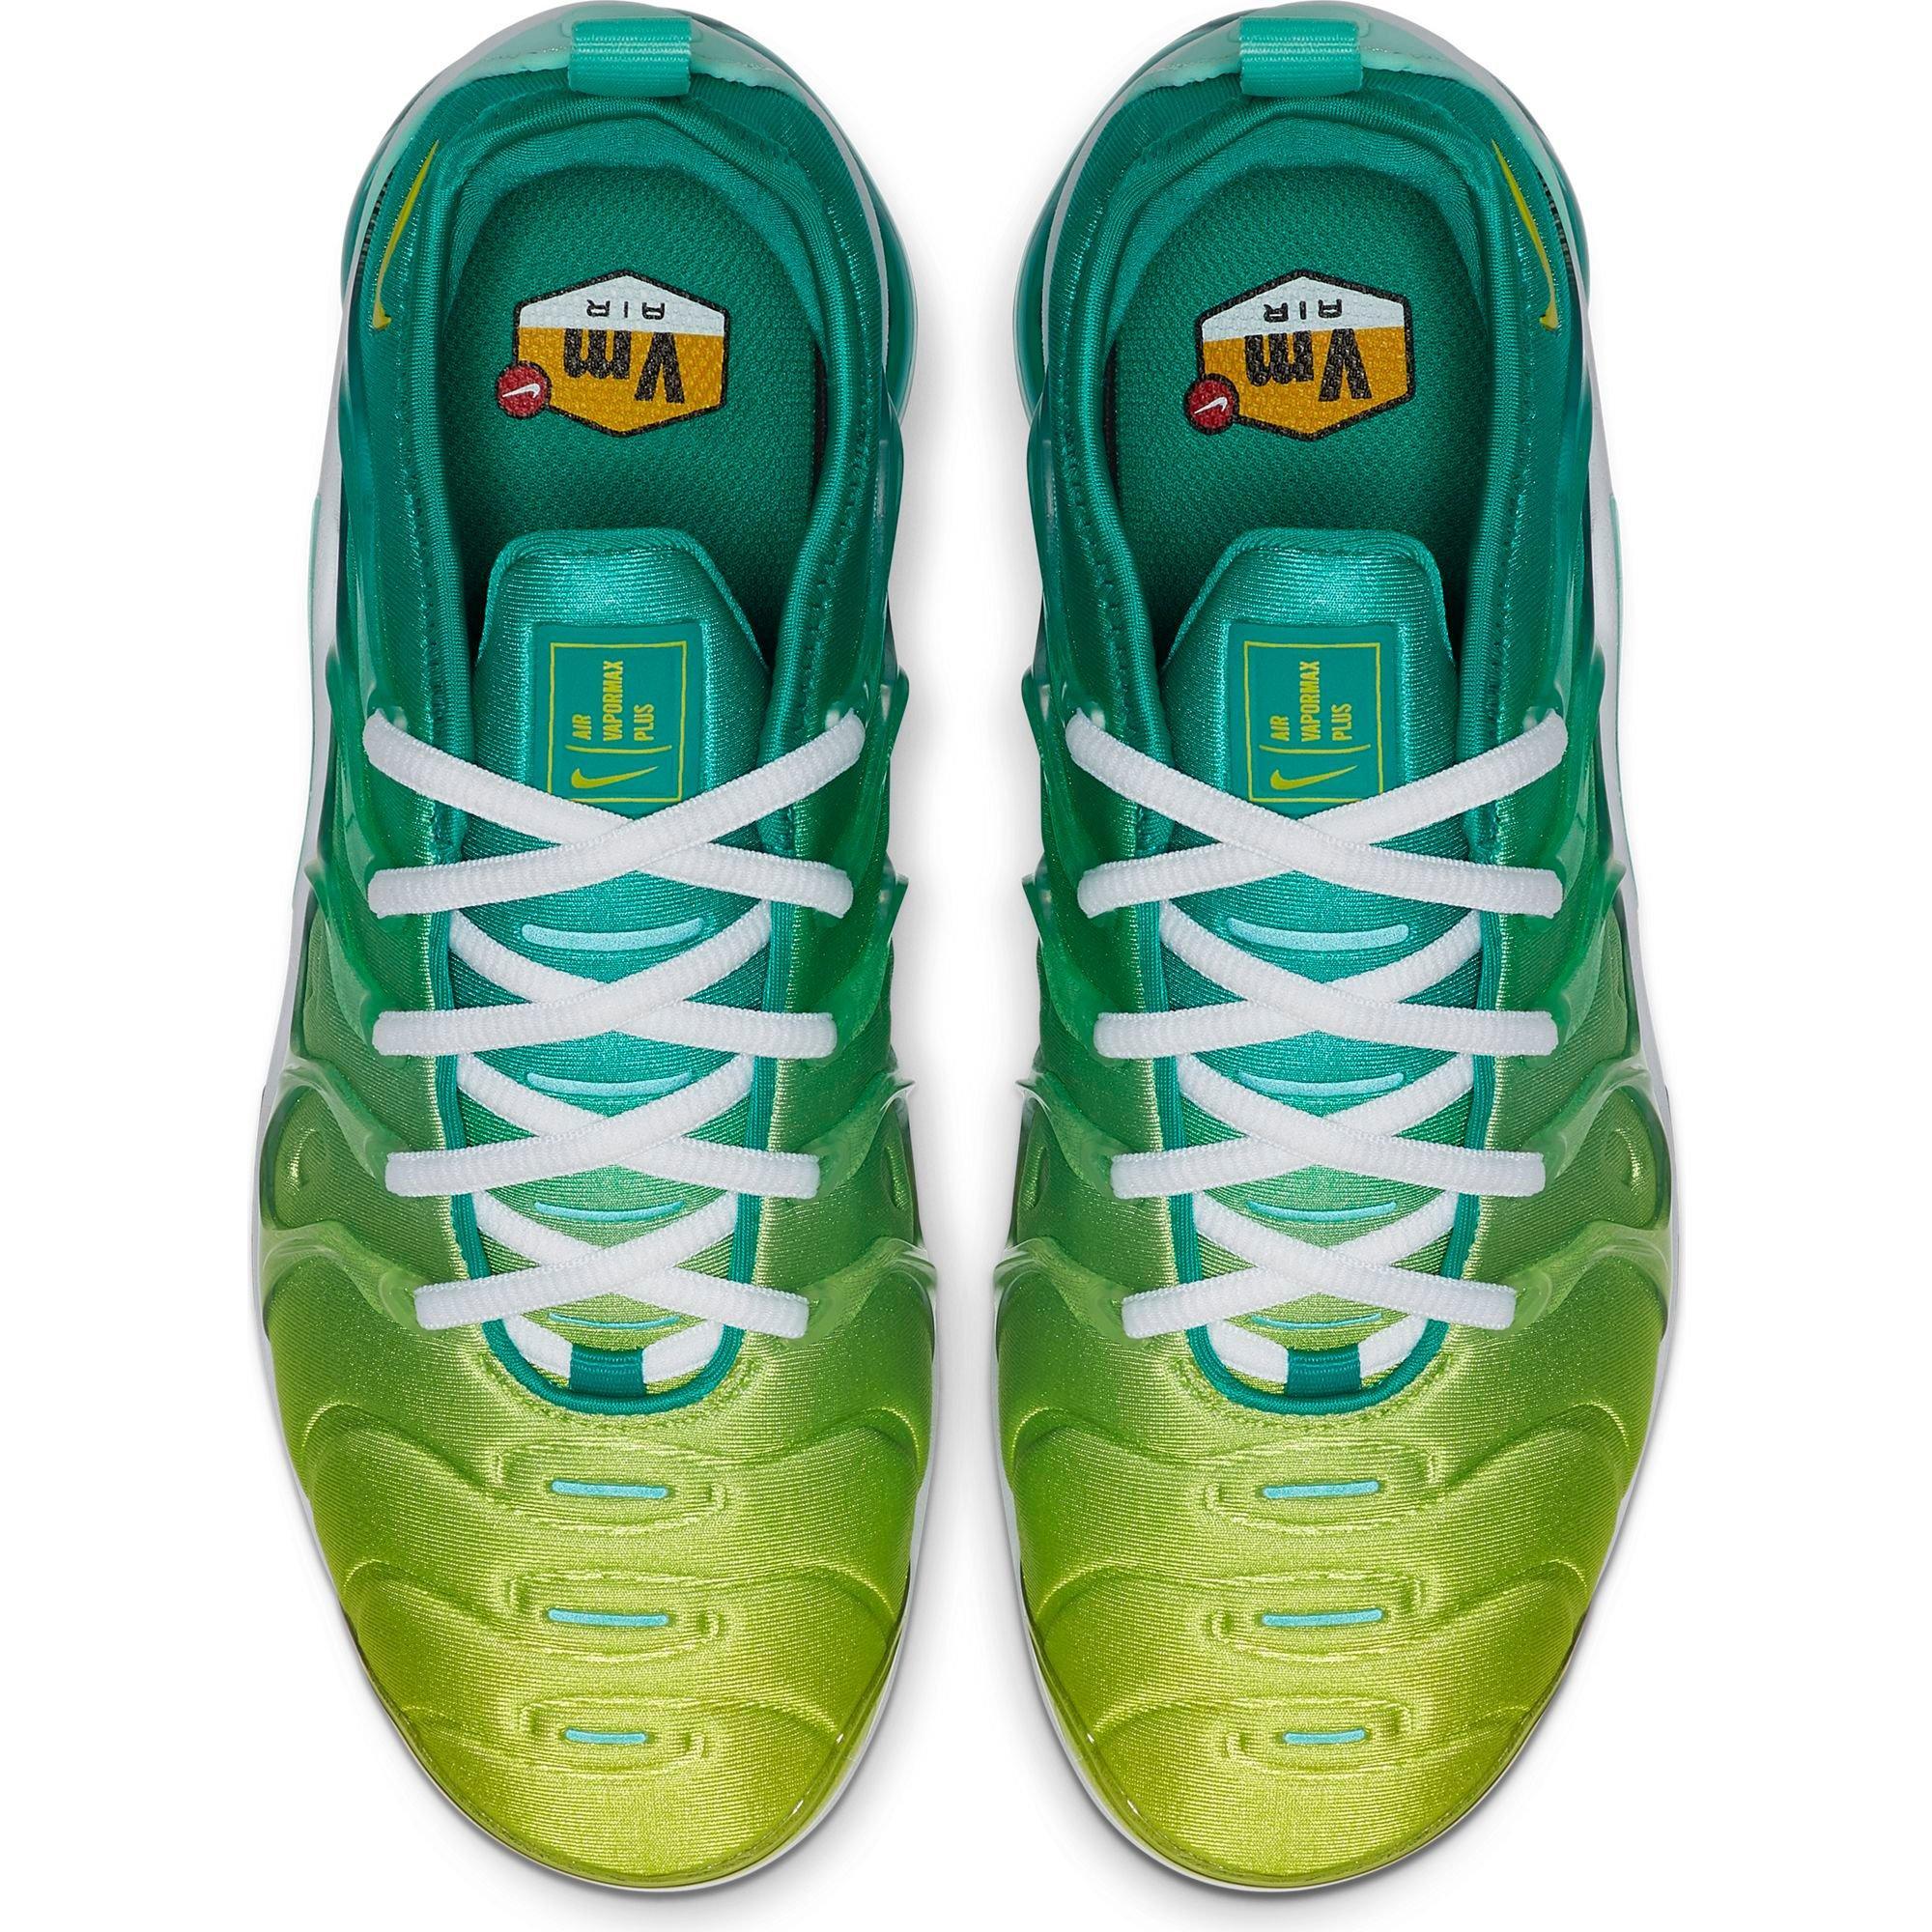 Nike Air VaporMax SE shoe for women. Nike BEBaskets Air Stylish ...